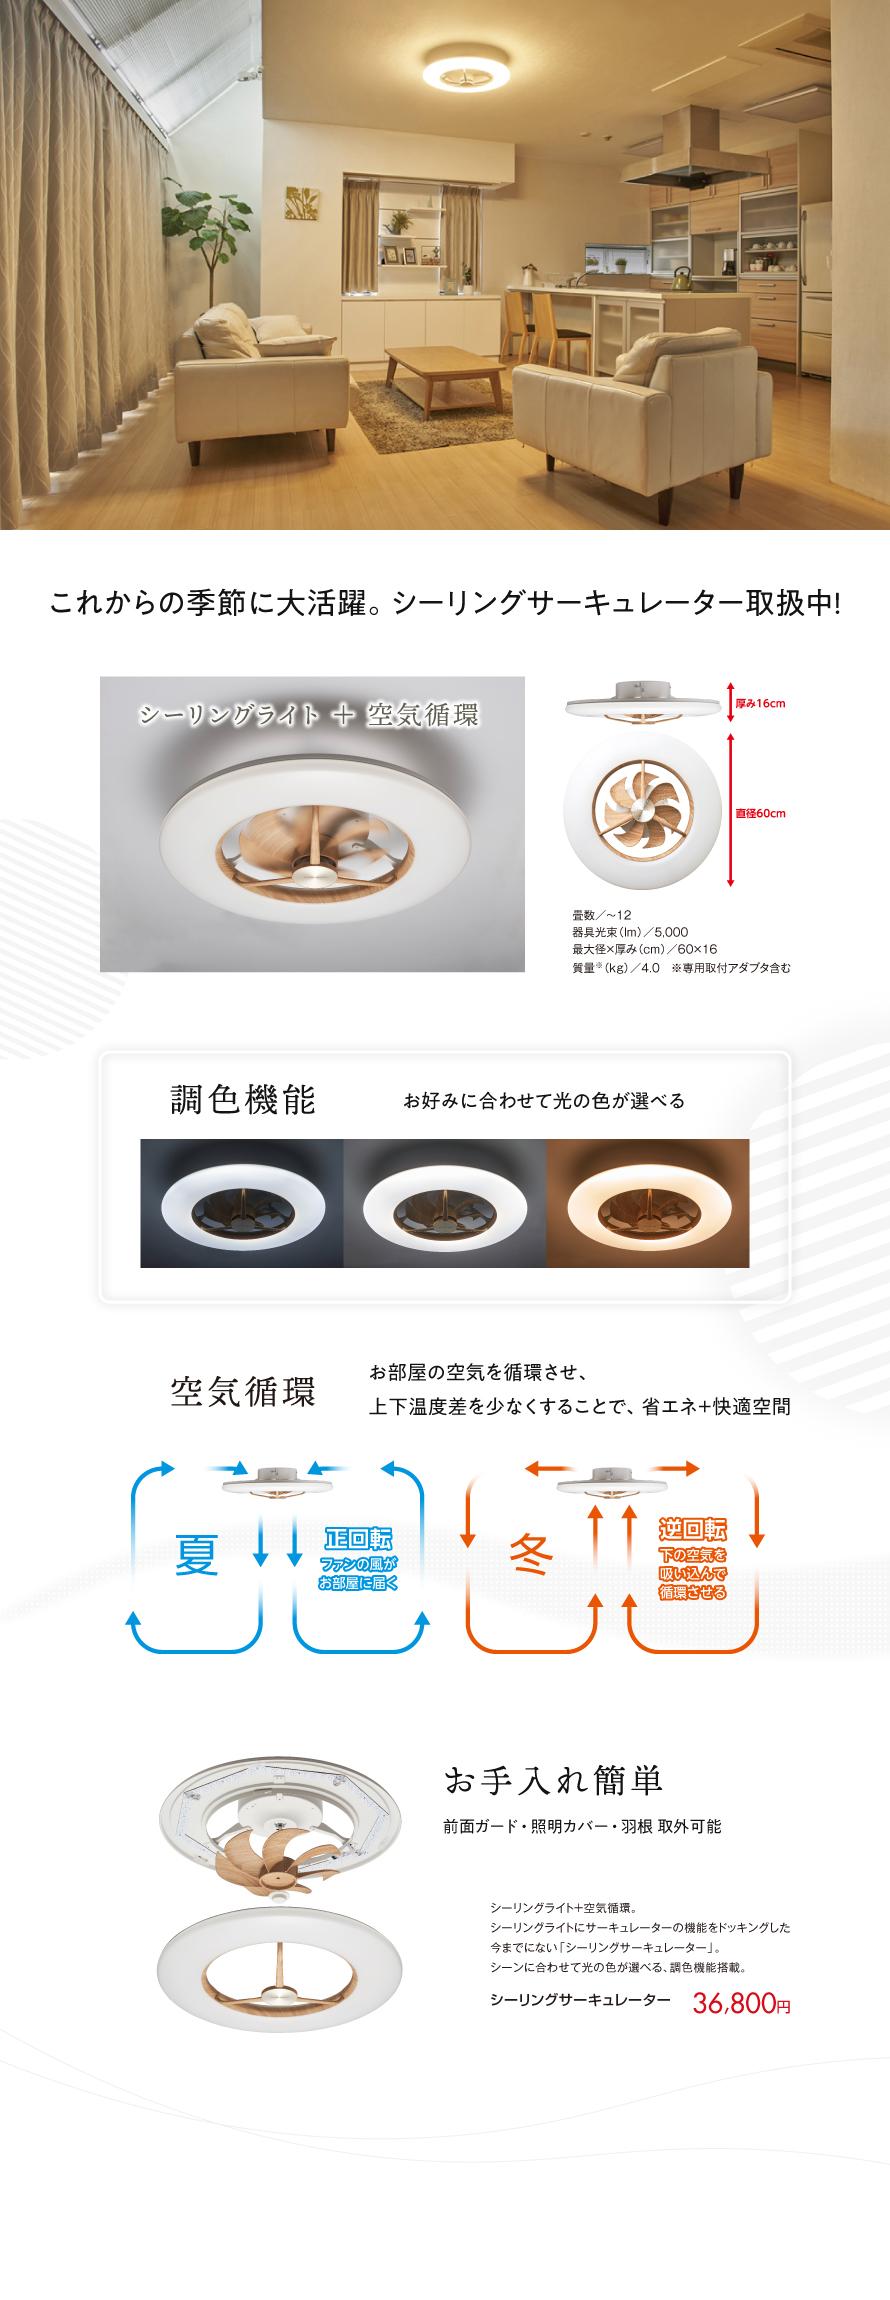 line@_0524ceilingcirculator_run_02.jpg